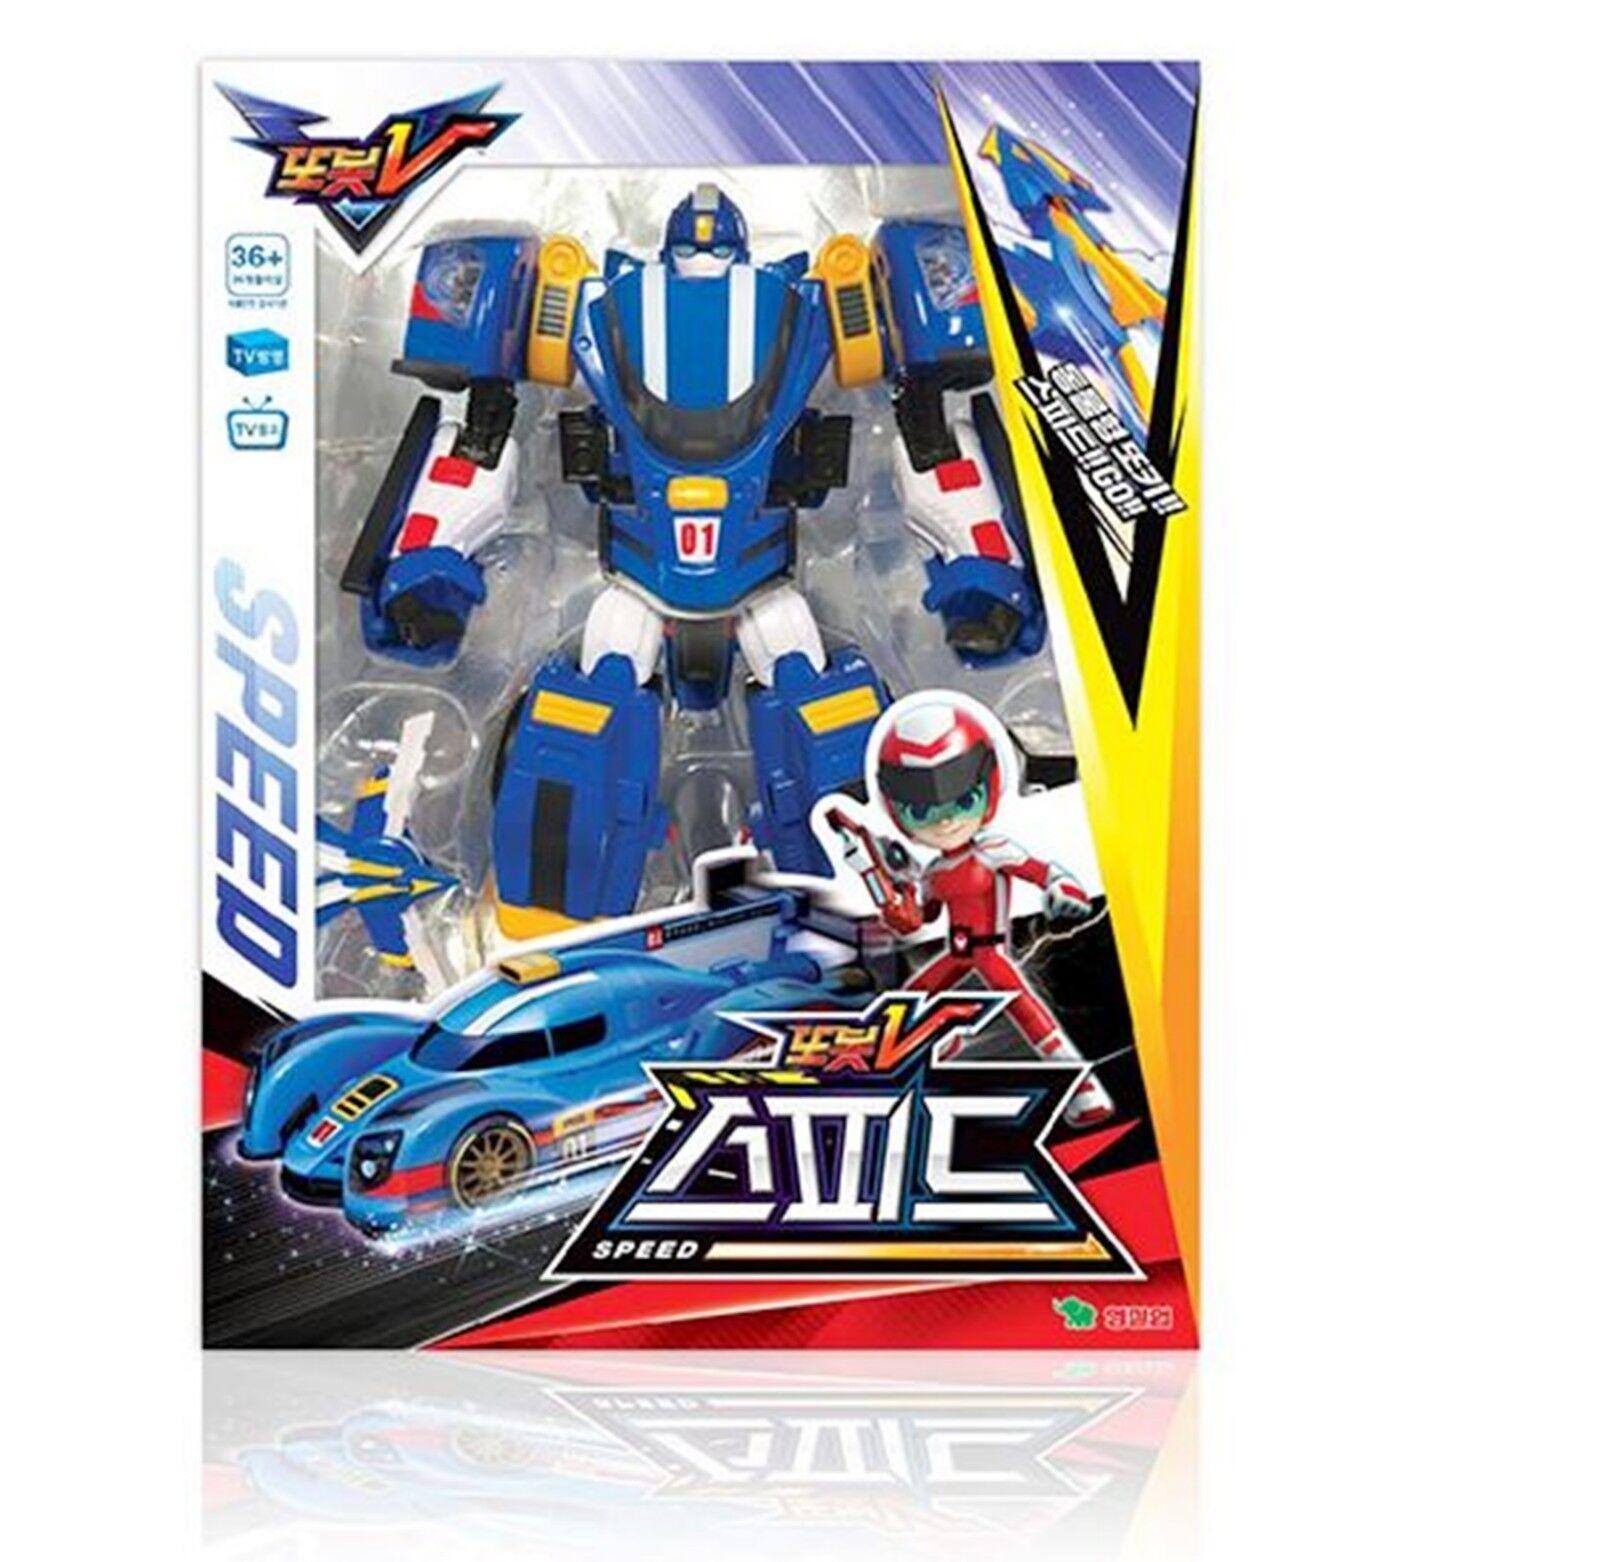 2018 TOBOT V SPEED bluee Transformer Transforming Space Robot Sports Car Toy